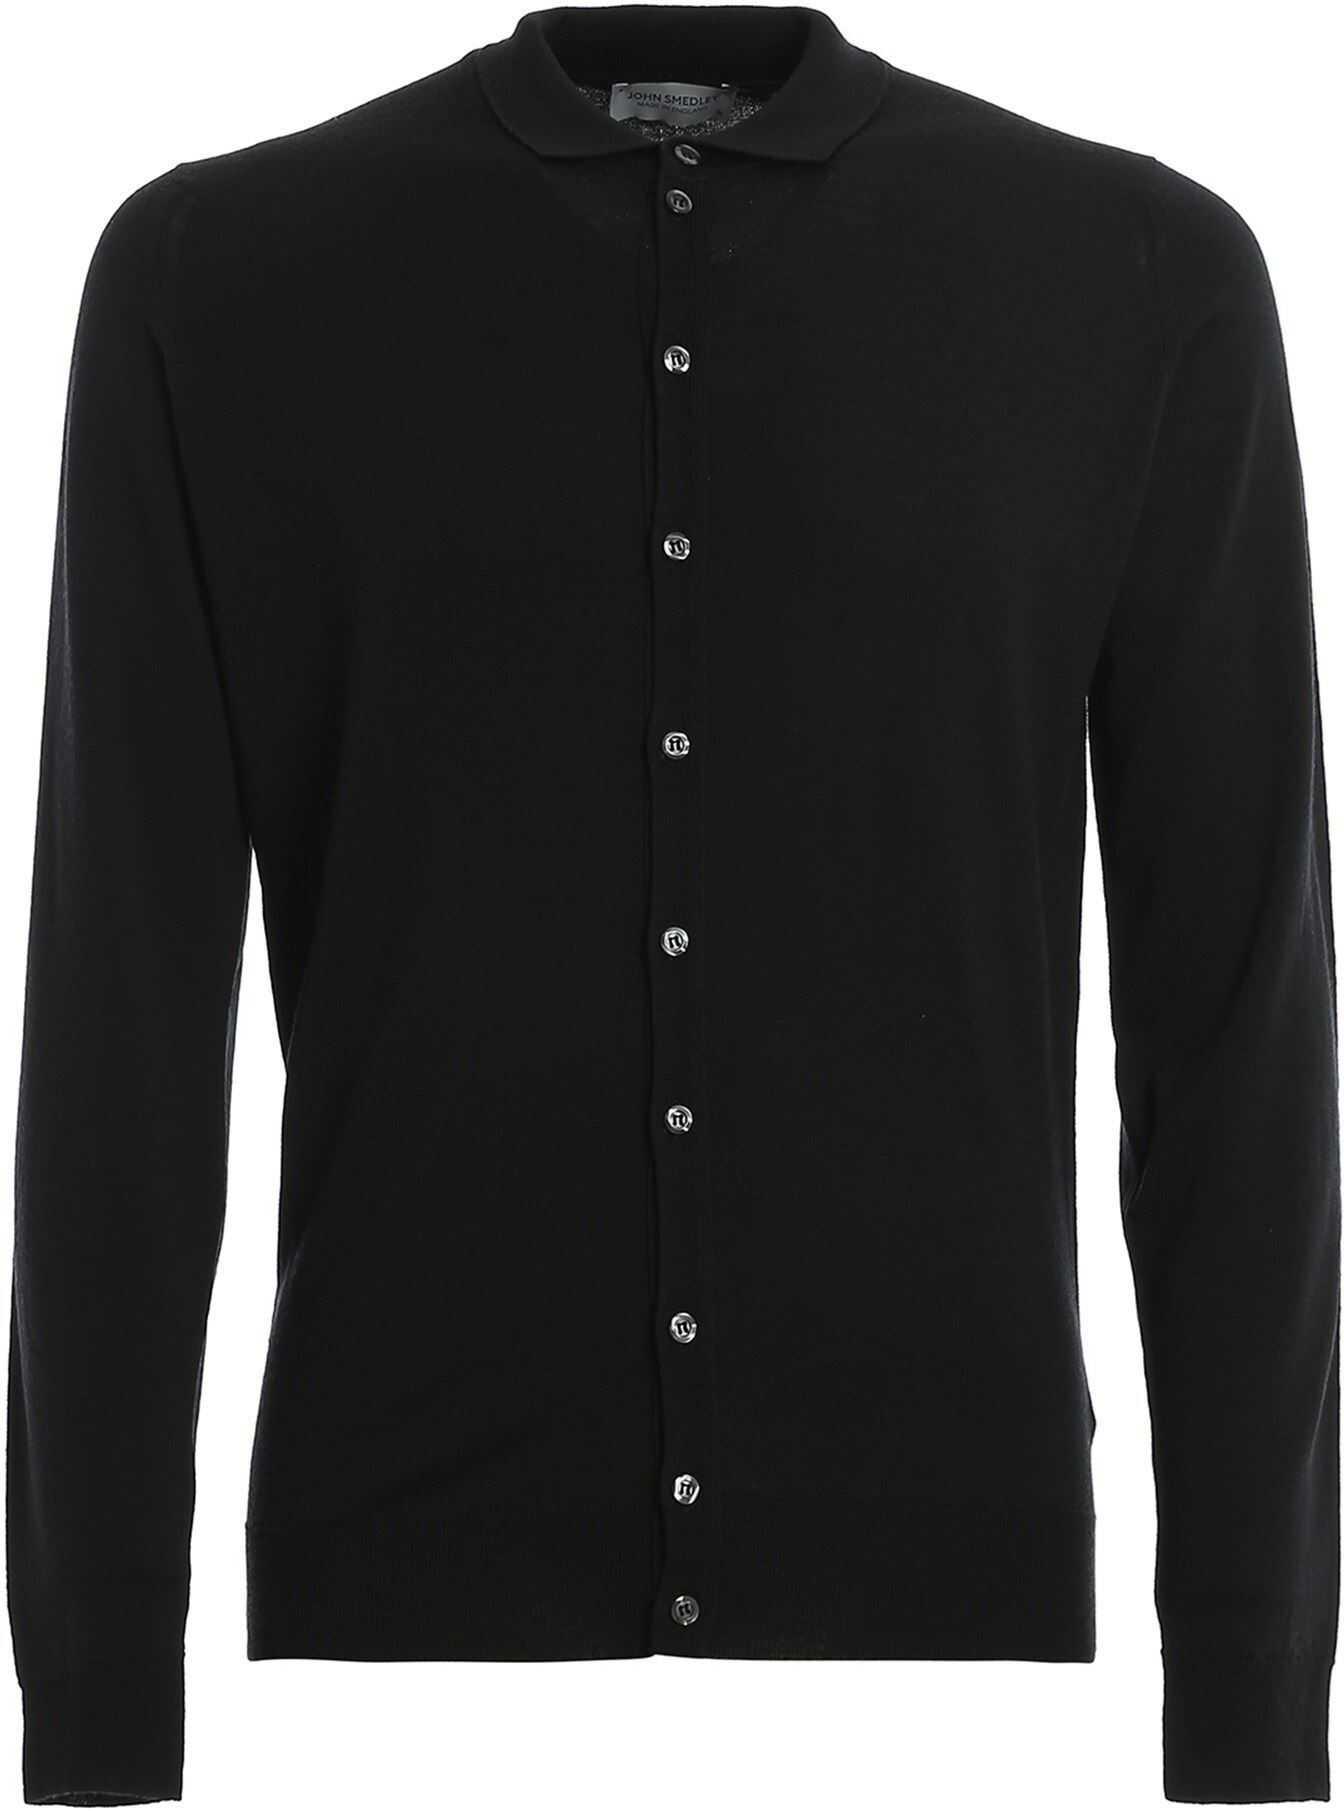 John Smedley Roston Shirt Style Cardigan In Black Black imagine